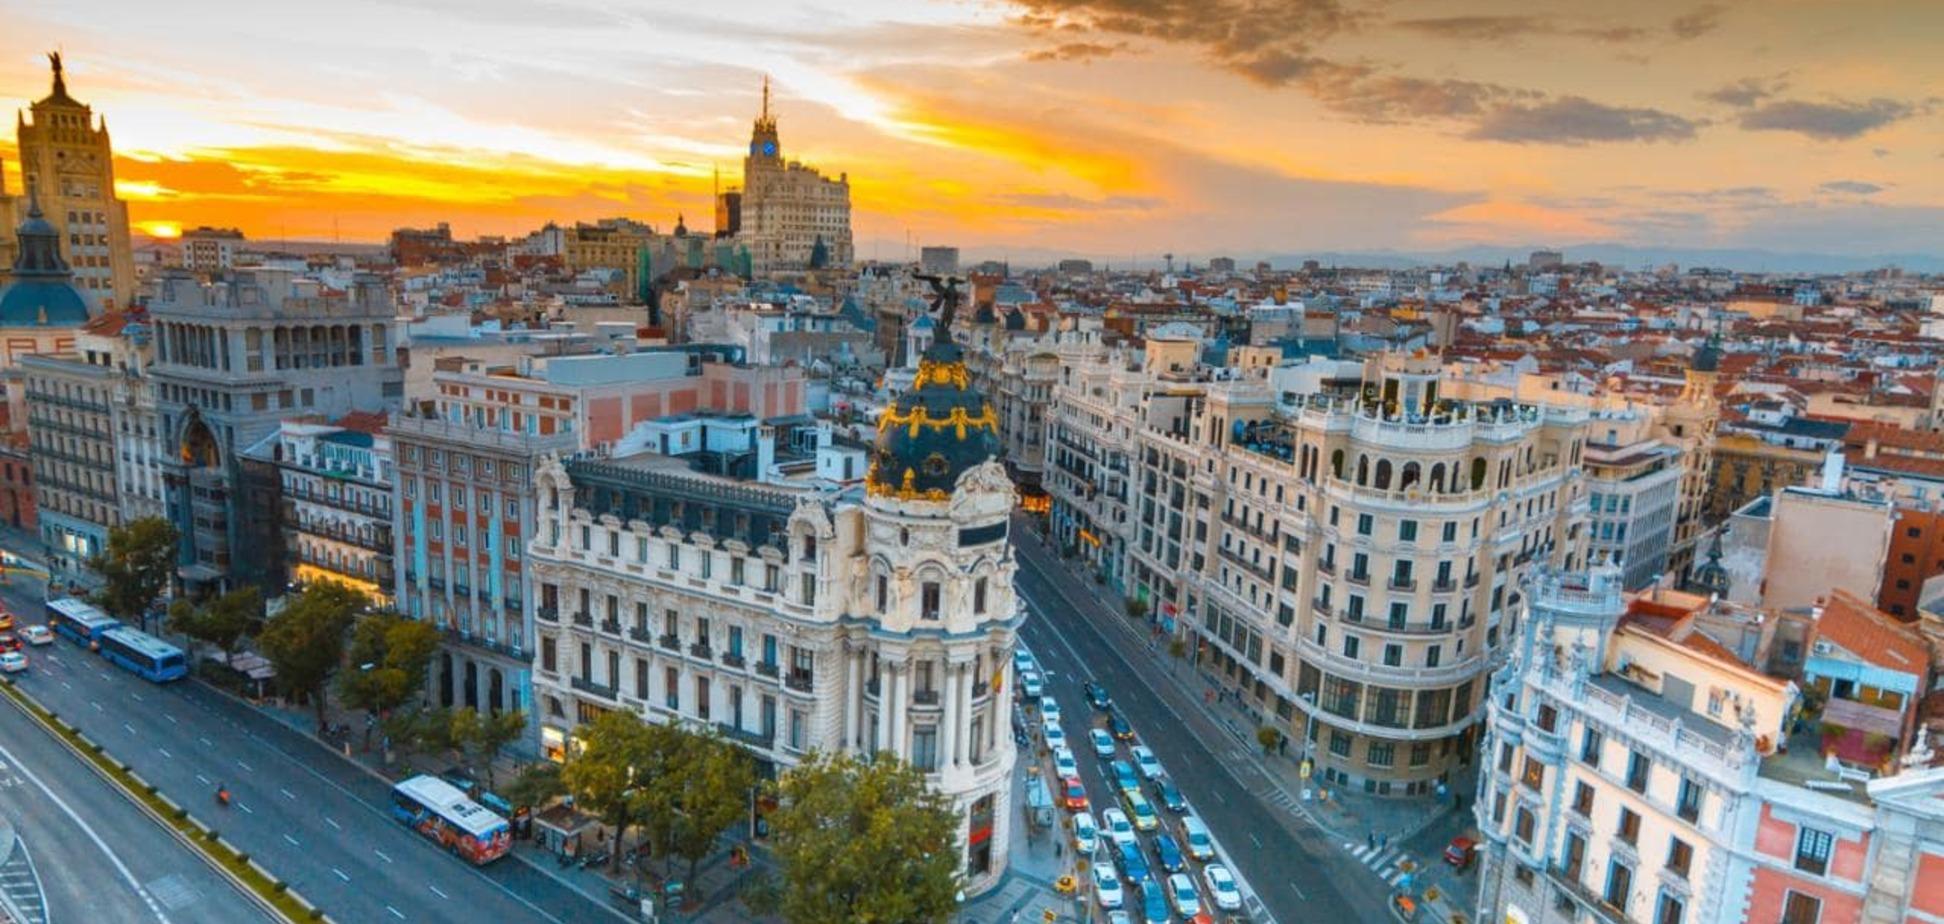 Испанцы негодуют! В Мадриде ограничат аренду квартир